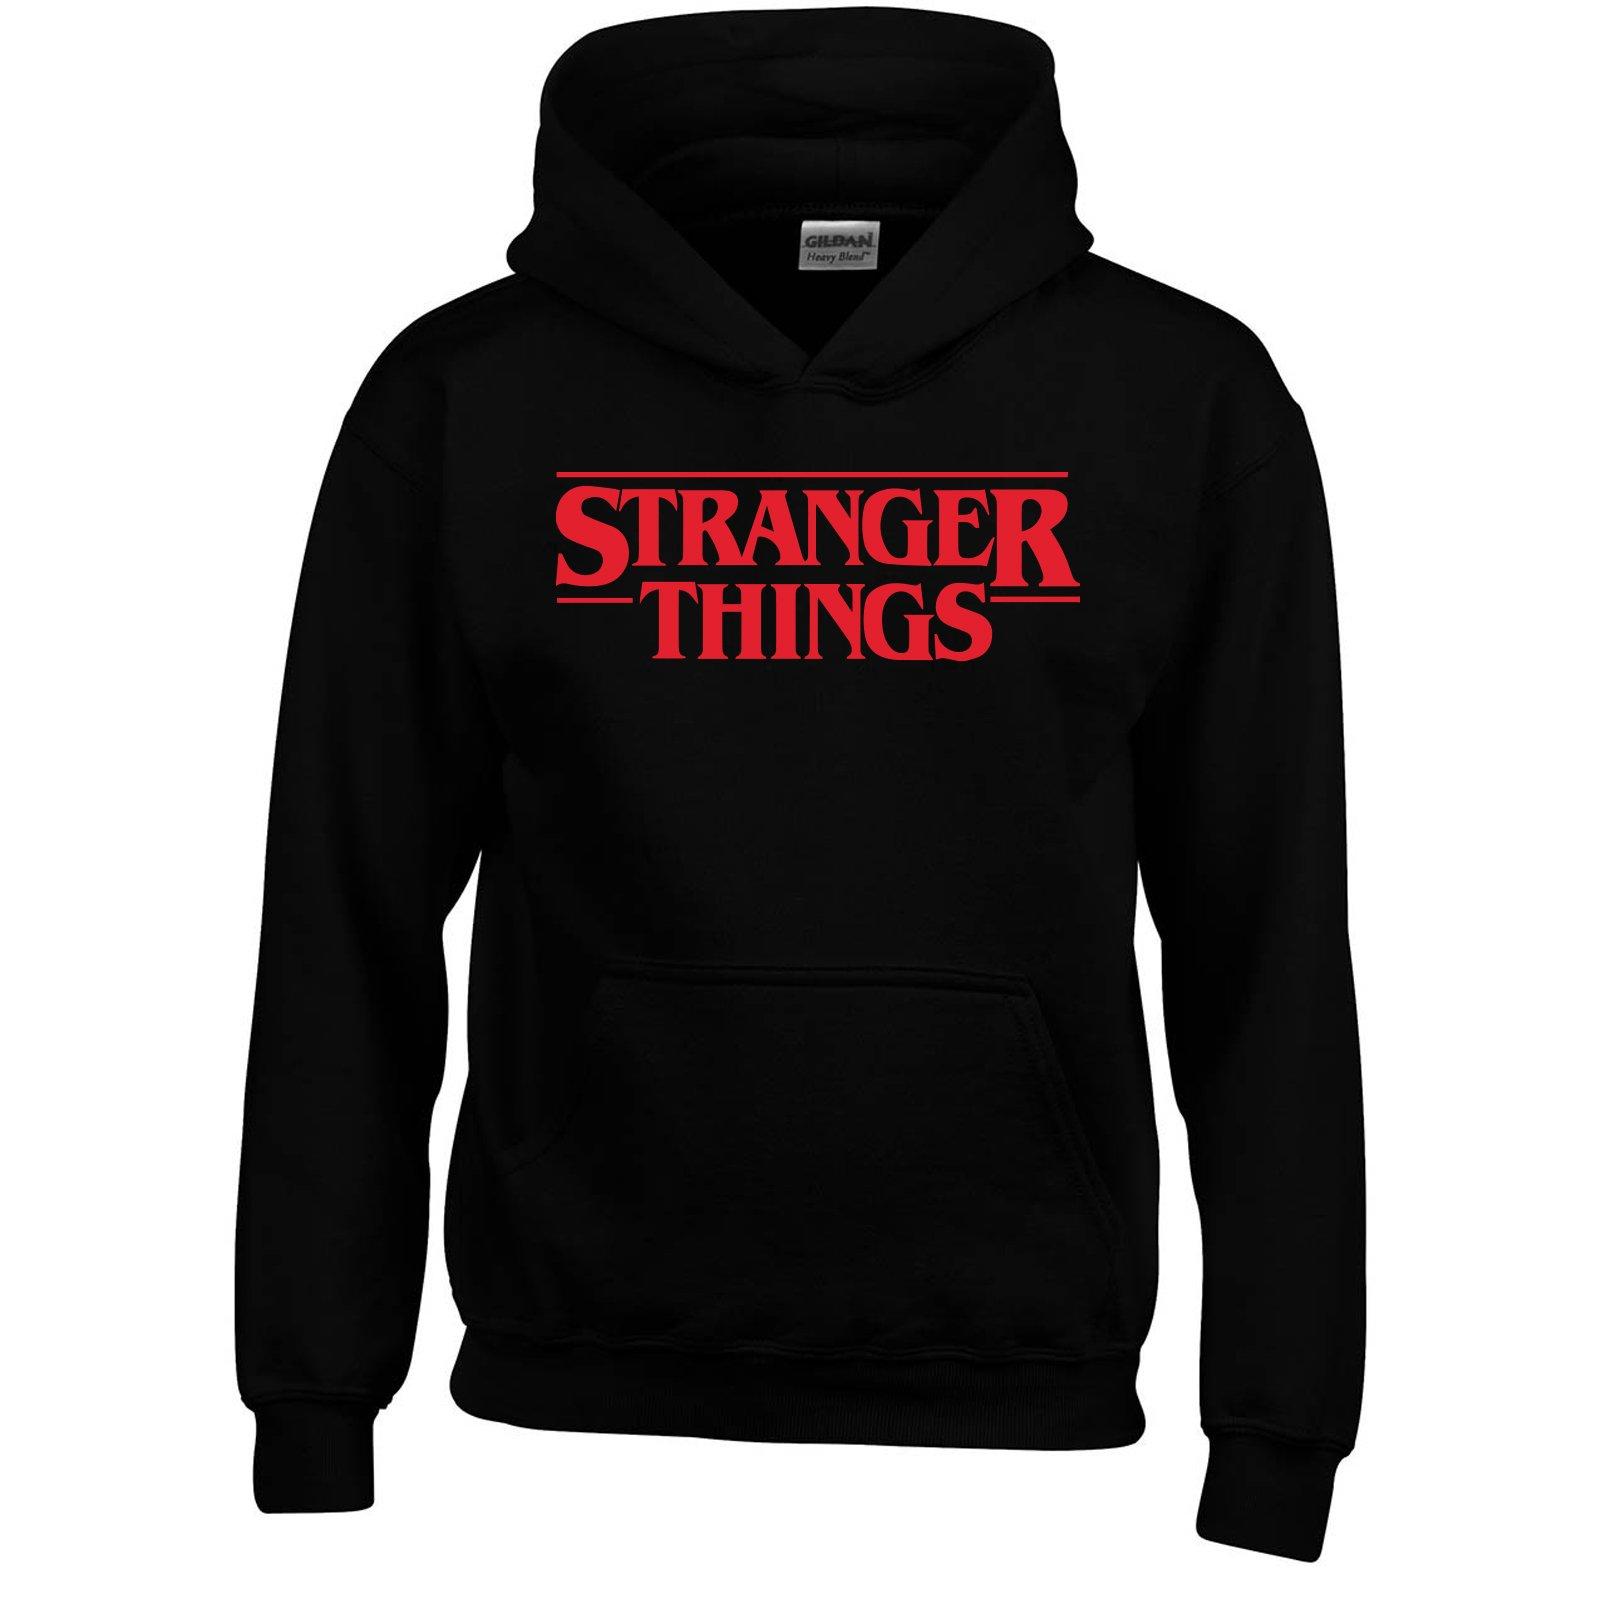 Stranger Things Boys Girls Kids Mens Hoodie Ebay